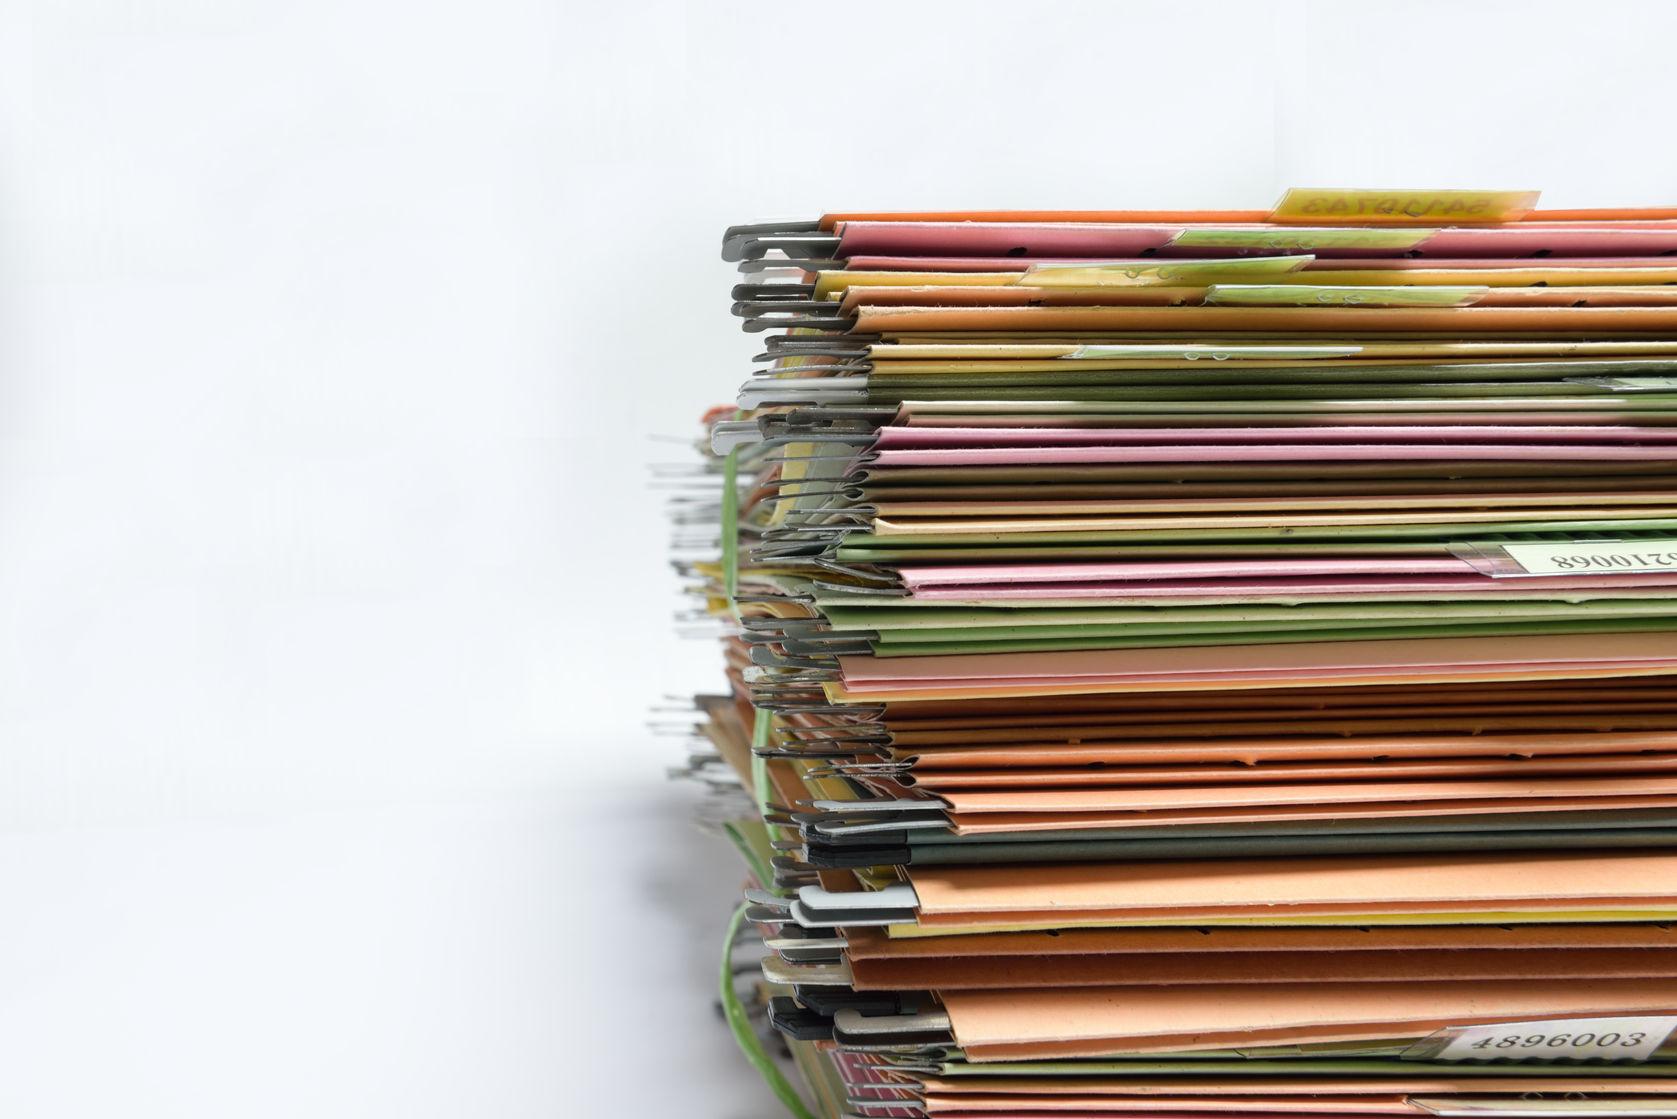 files - cryptocurrencies legal